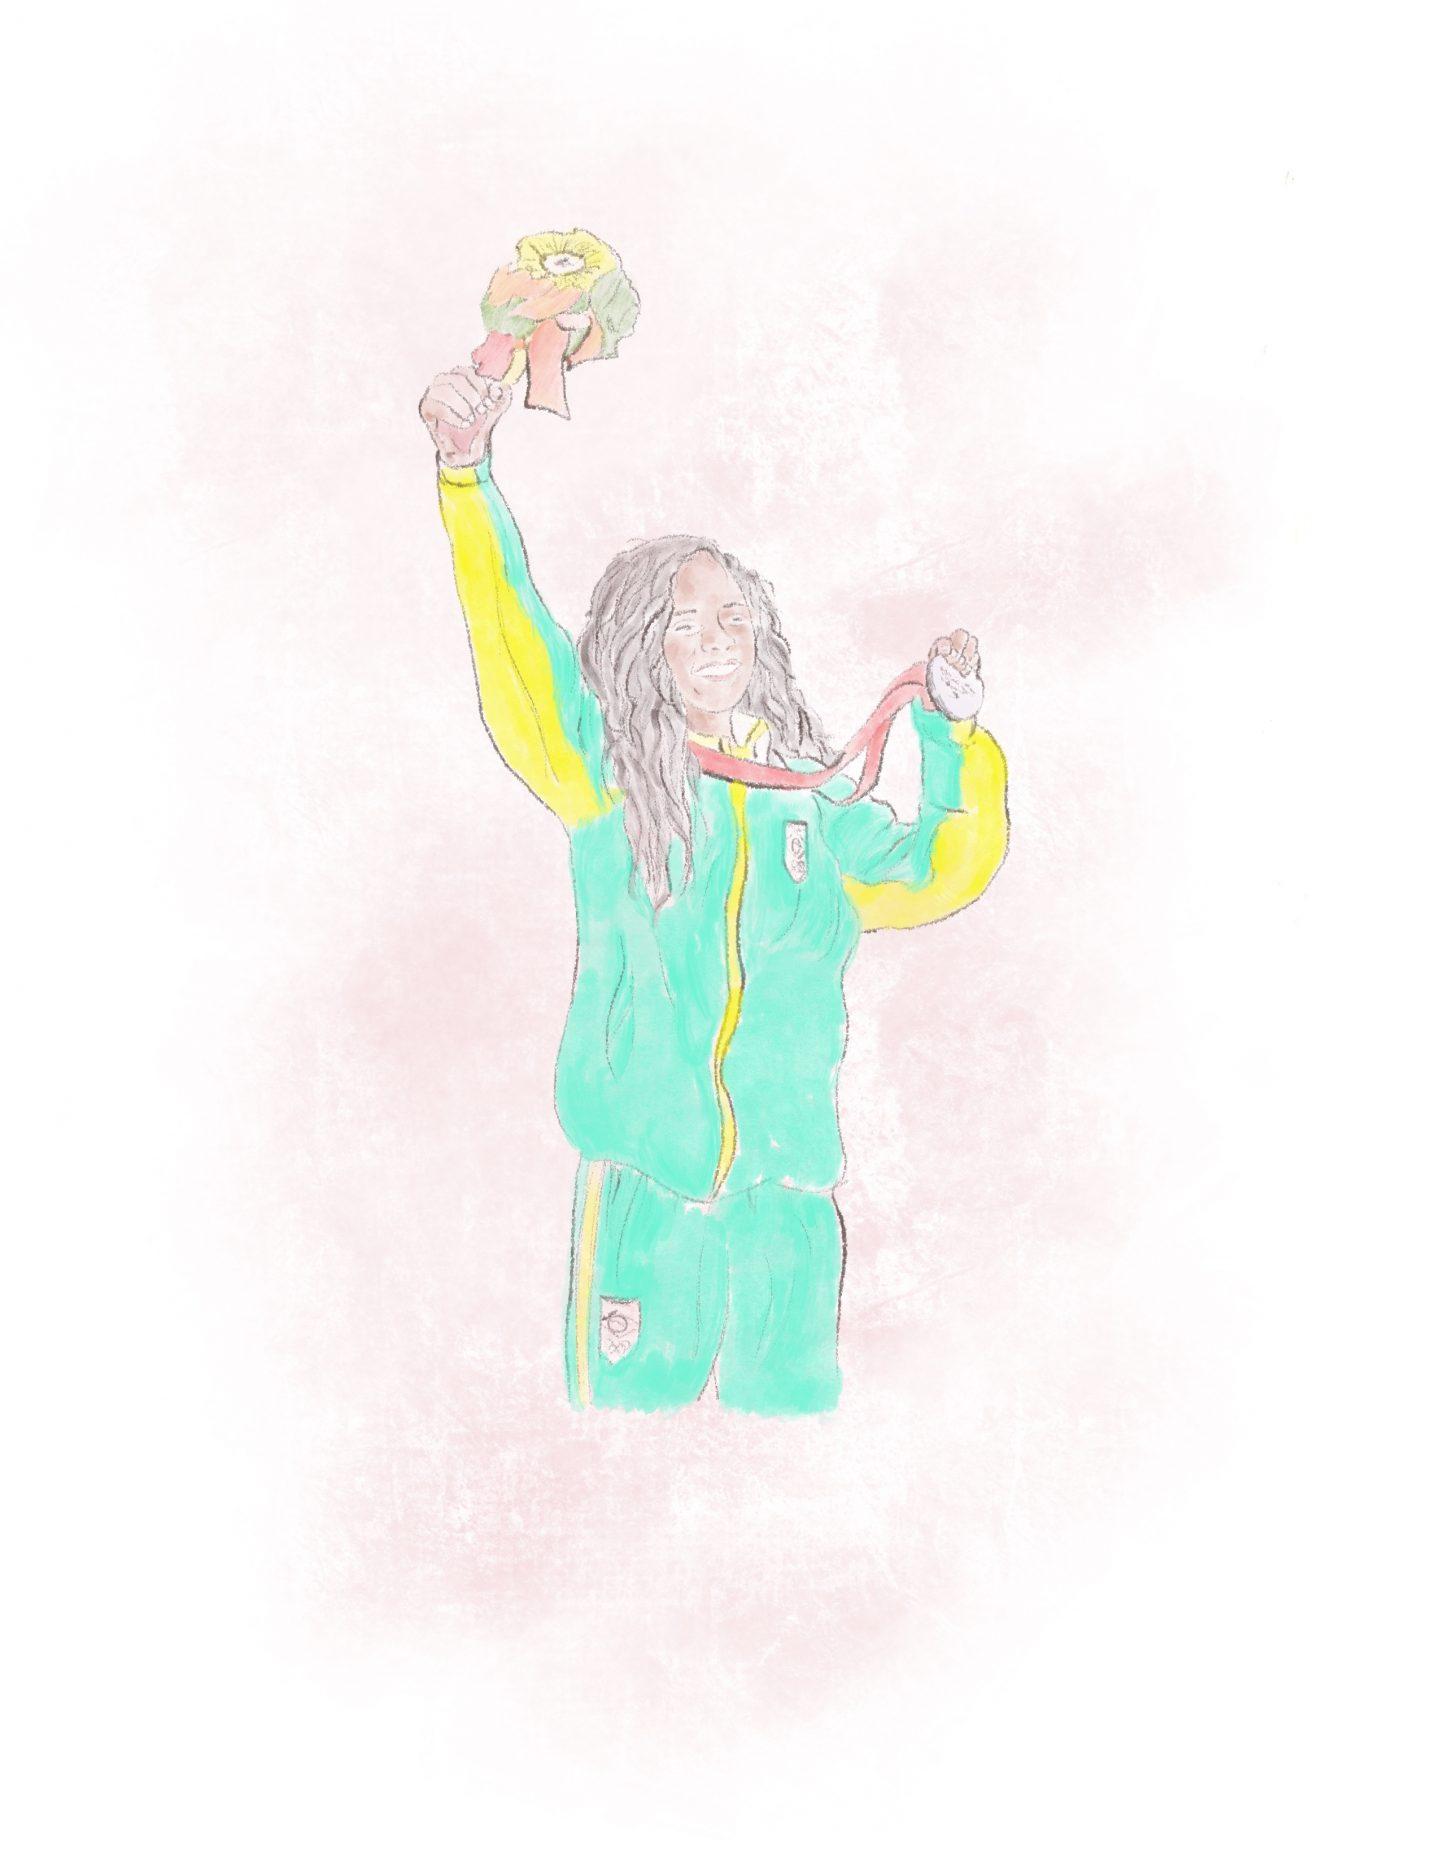 Brazilian skateboarder Rayssa Leal Illustration